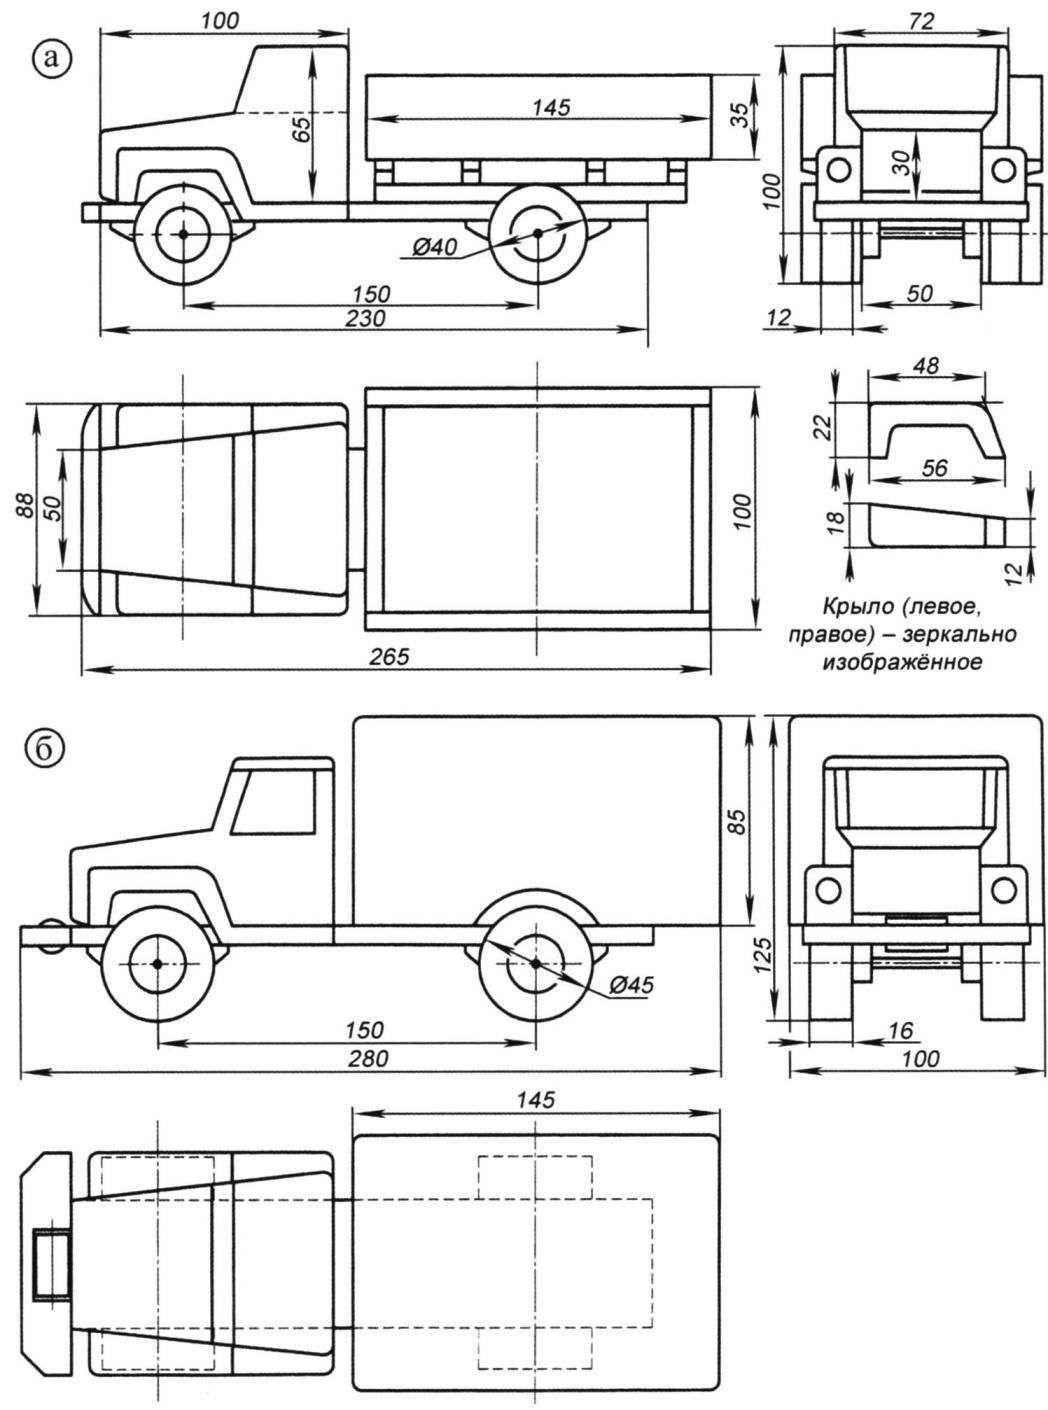 PDF 1 Popular Mechanics Cyclekart Plans Free Download PDF